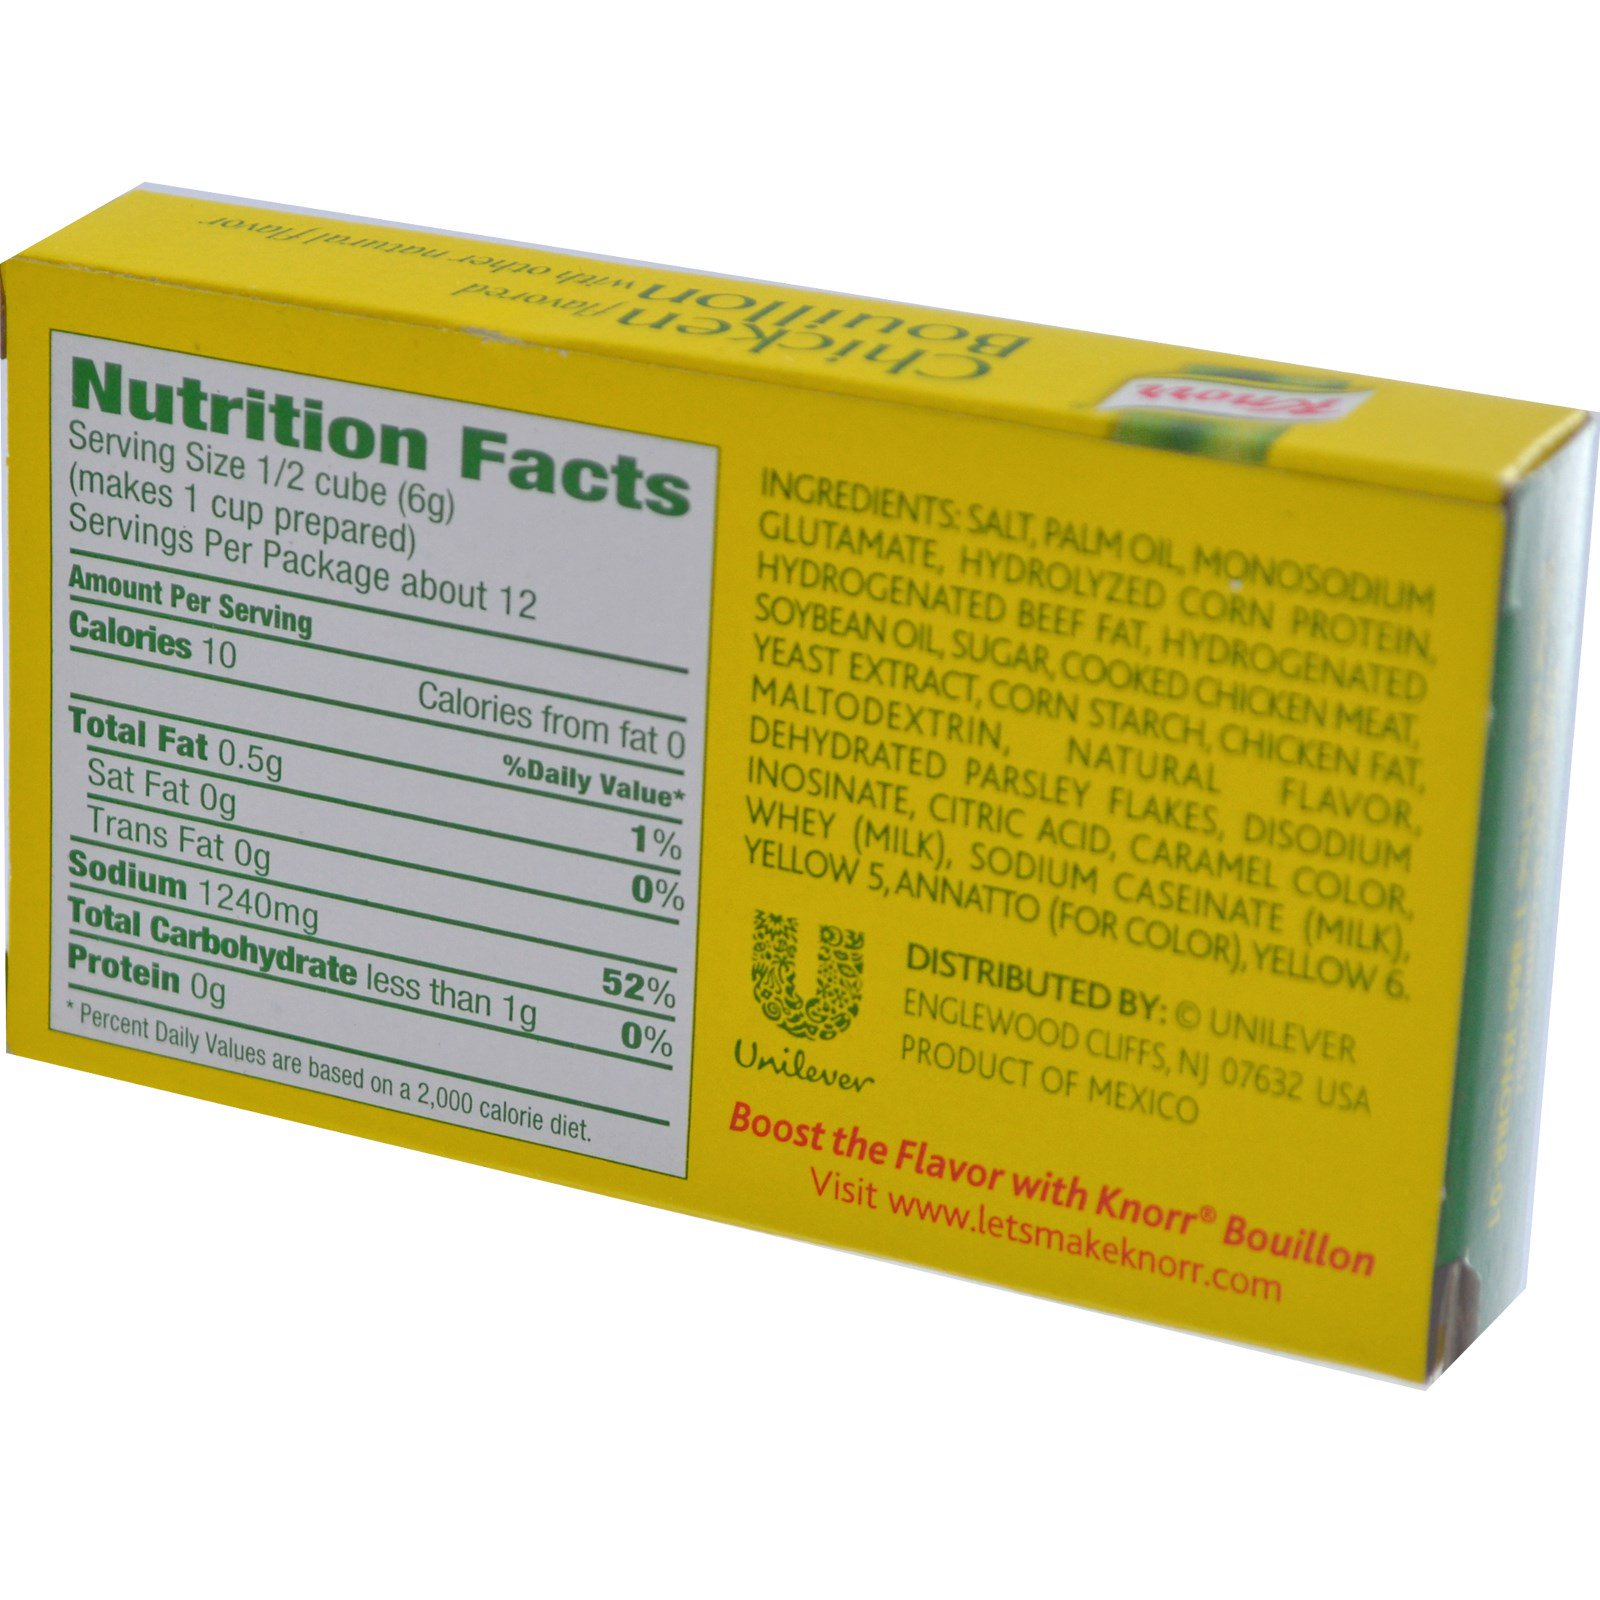 Knorr, Chicken Flavored Bouillon, 6